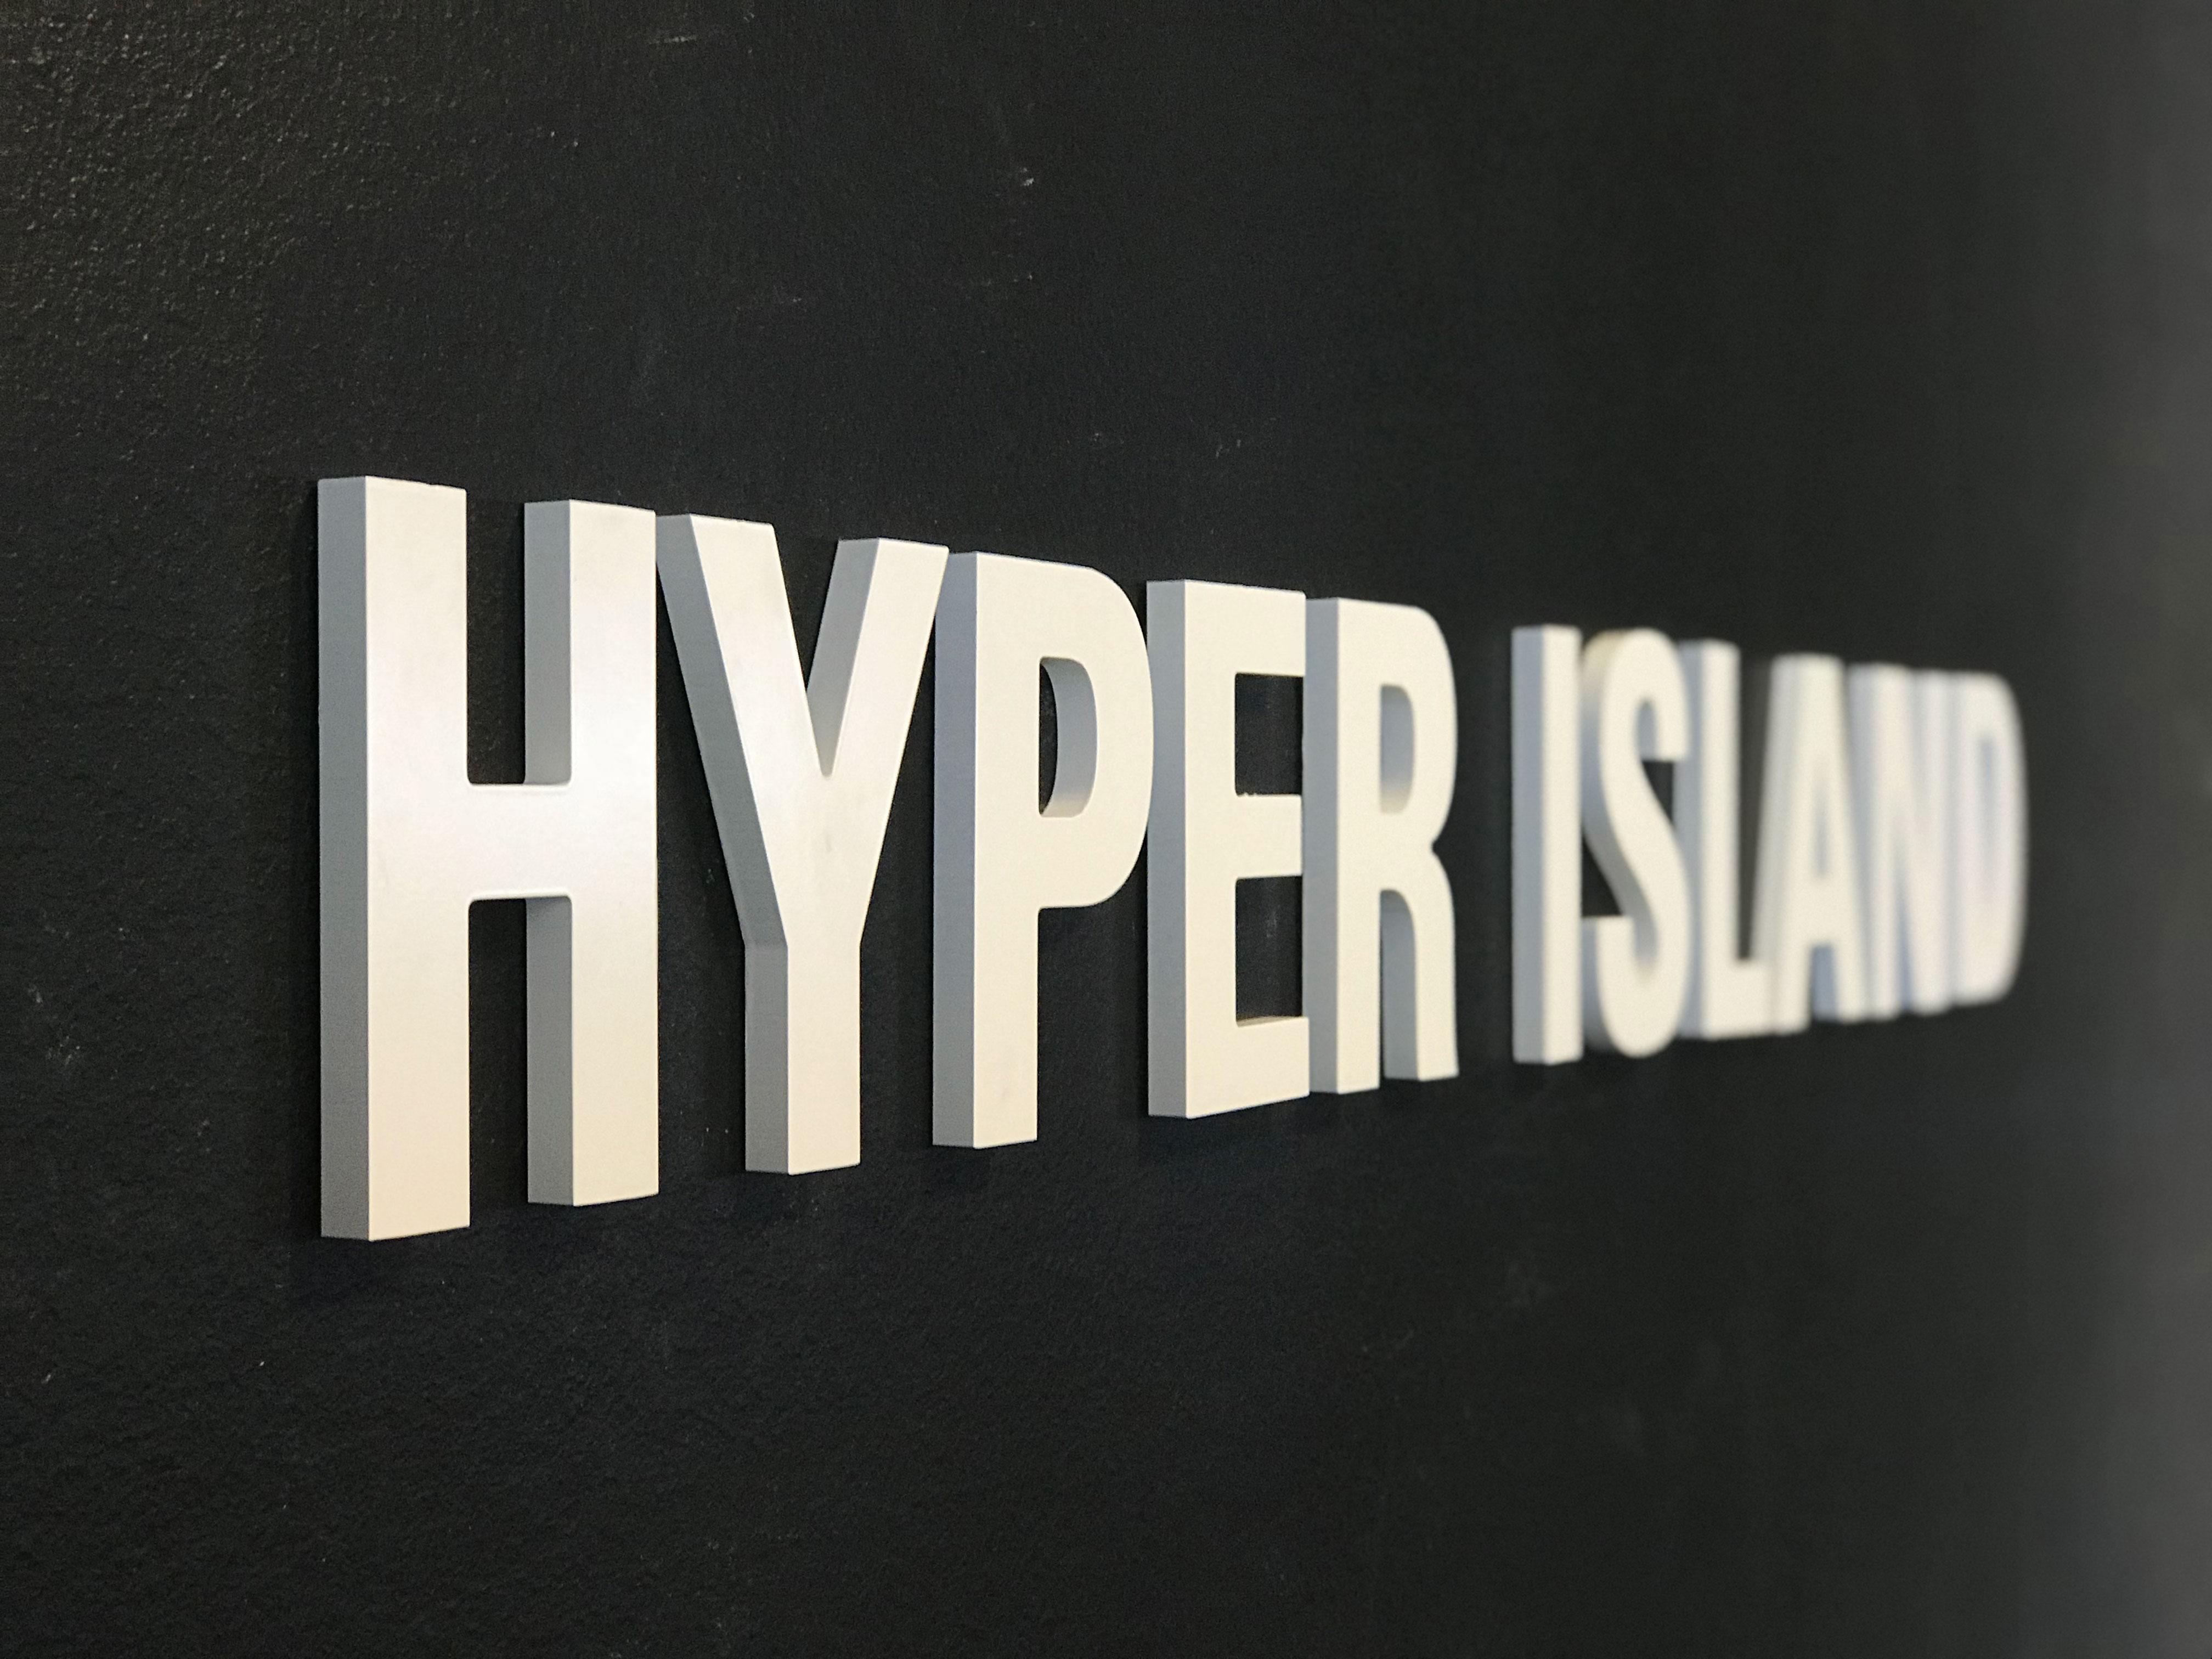 Hyper Island